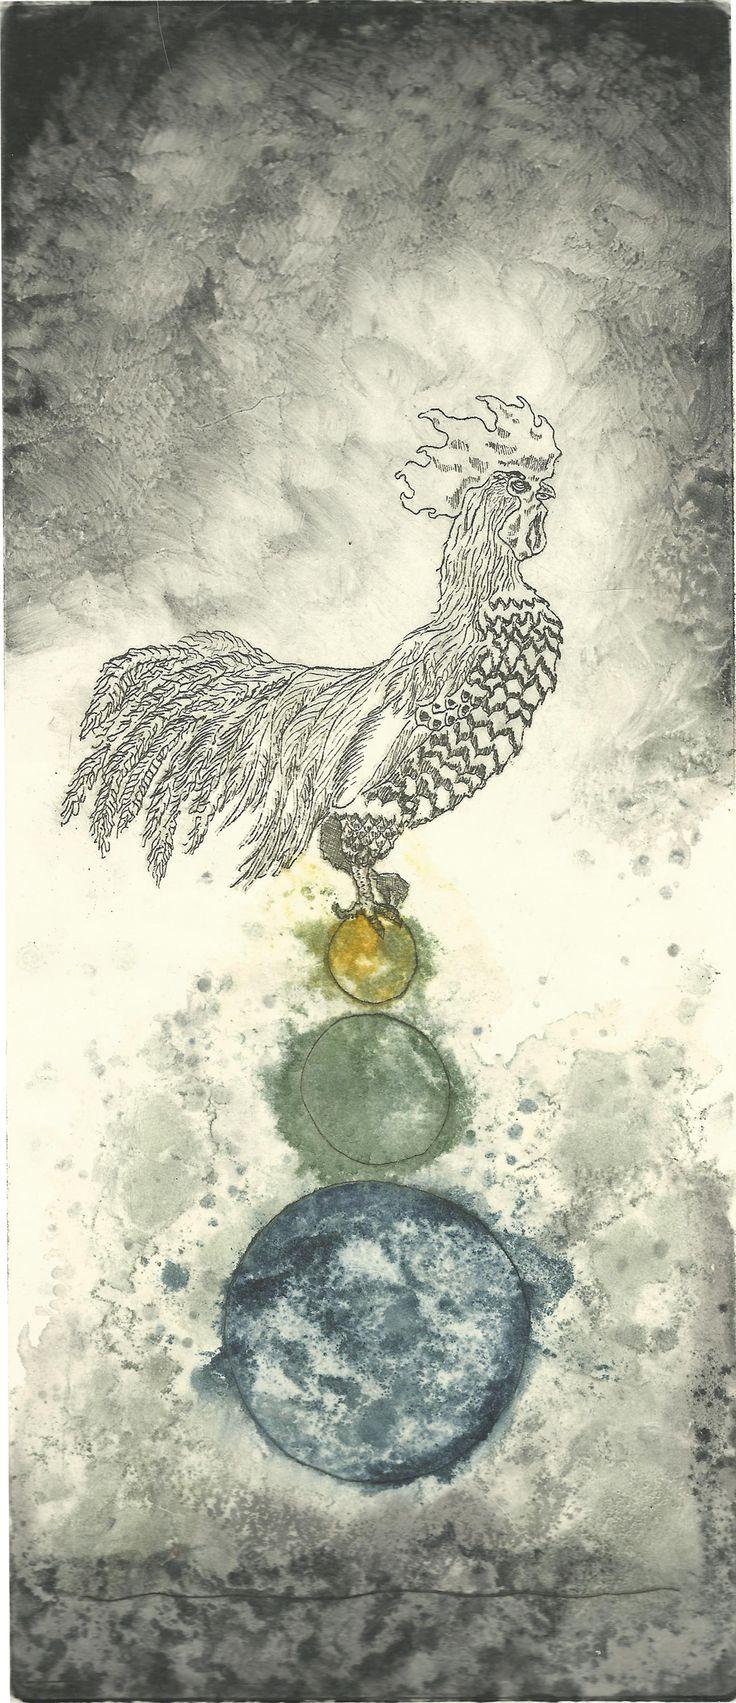 Seppo Alanissi - Kukko I / Rooster I, 2012, etching, monotype